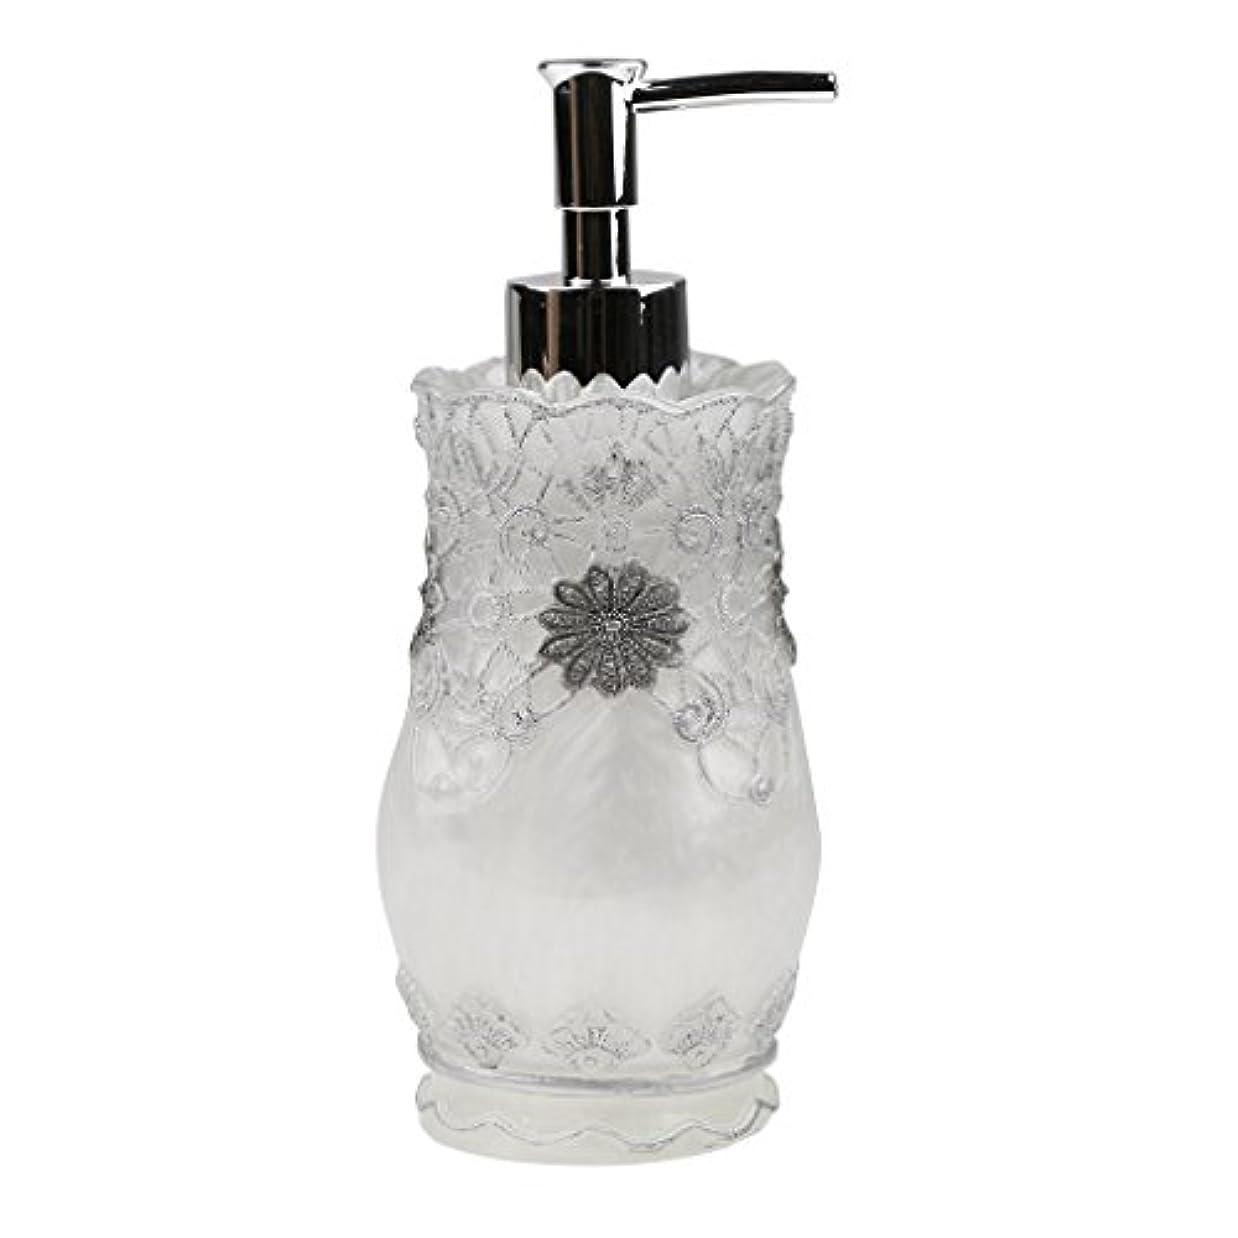 Homyl 液体ソープ シャンプー用 空 シャンプー ボトル  詰め替えボトル 美しい エレガント デザイン  全4種類 - #2